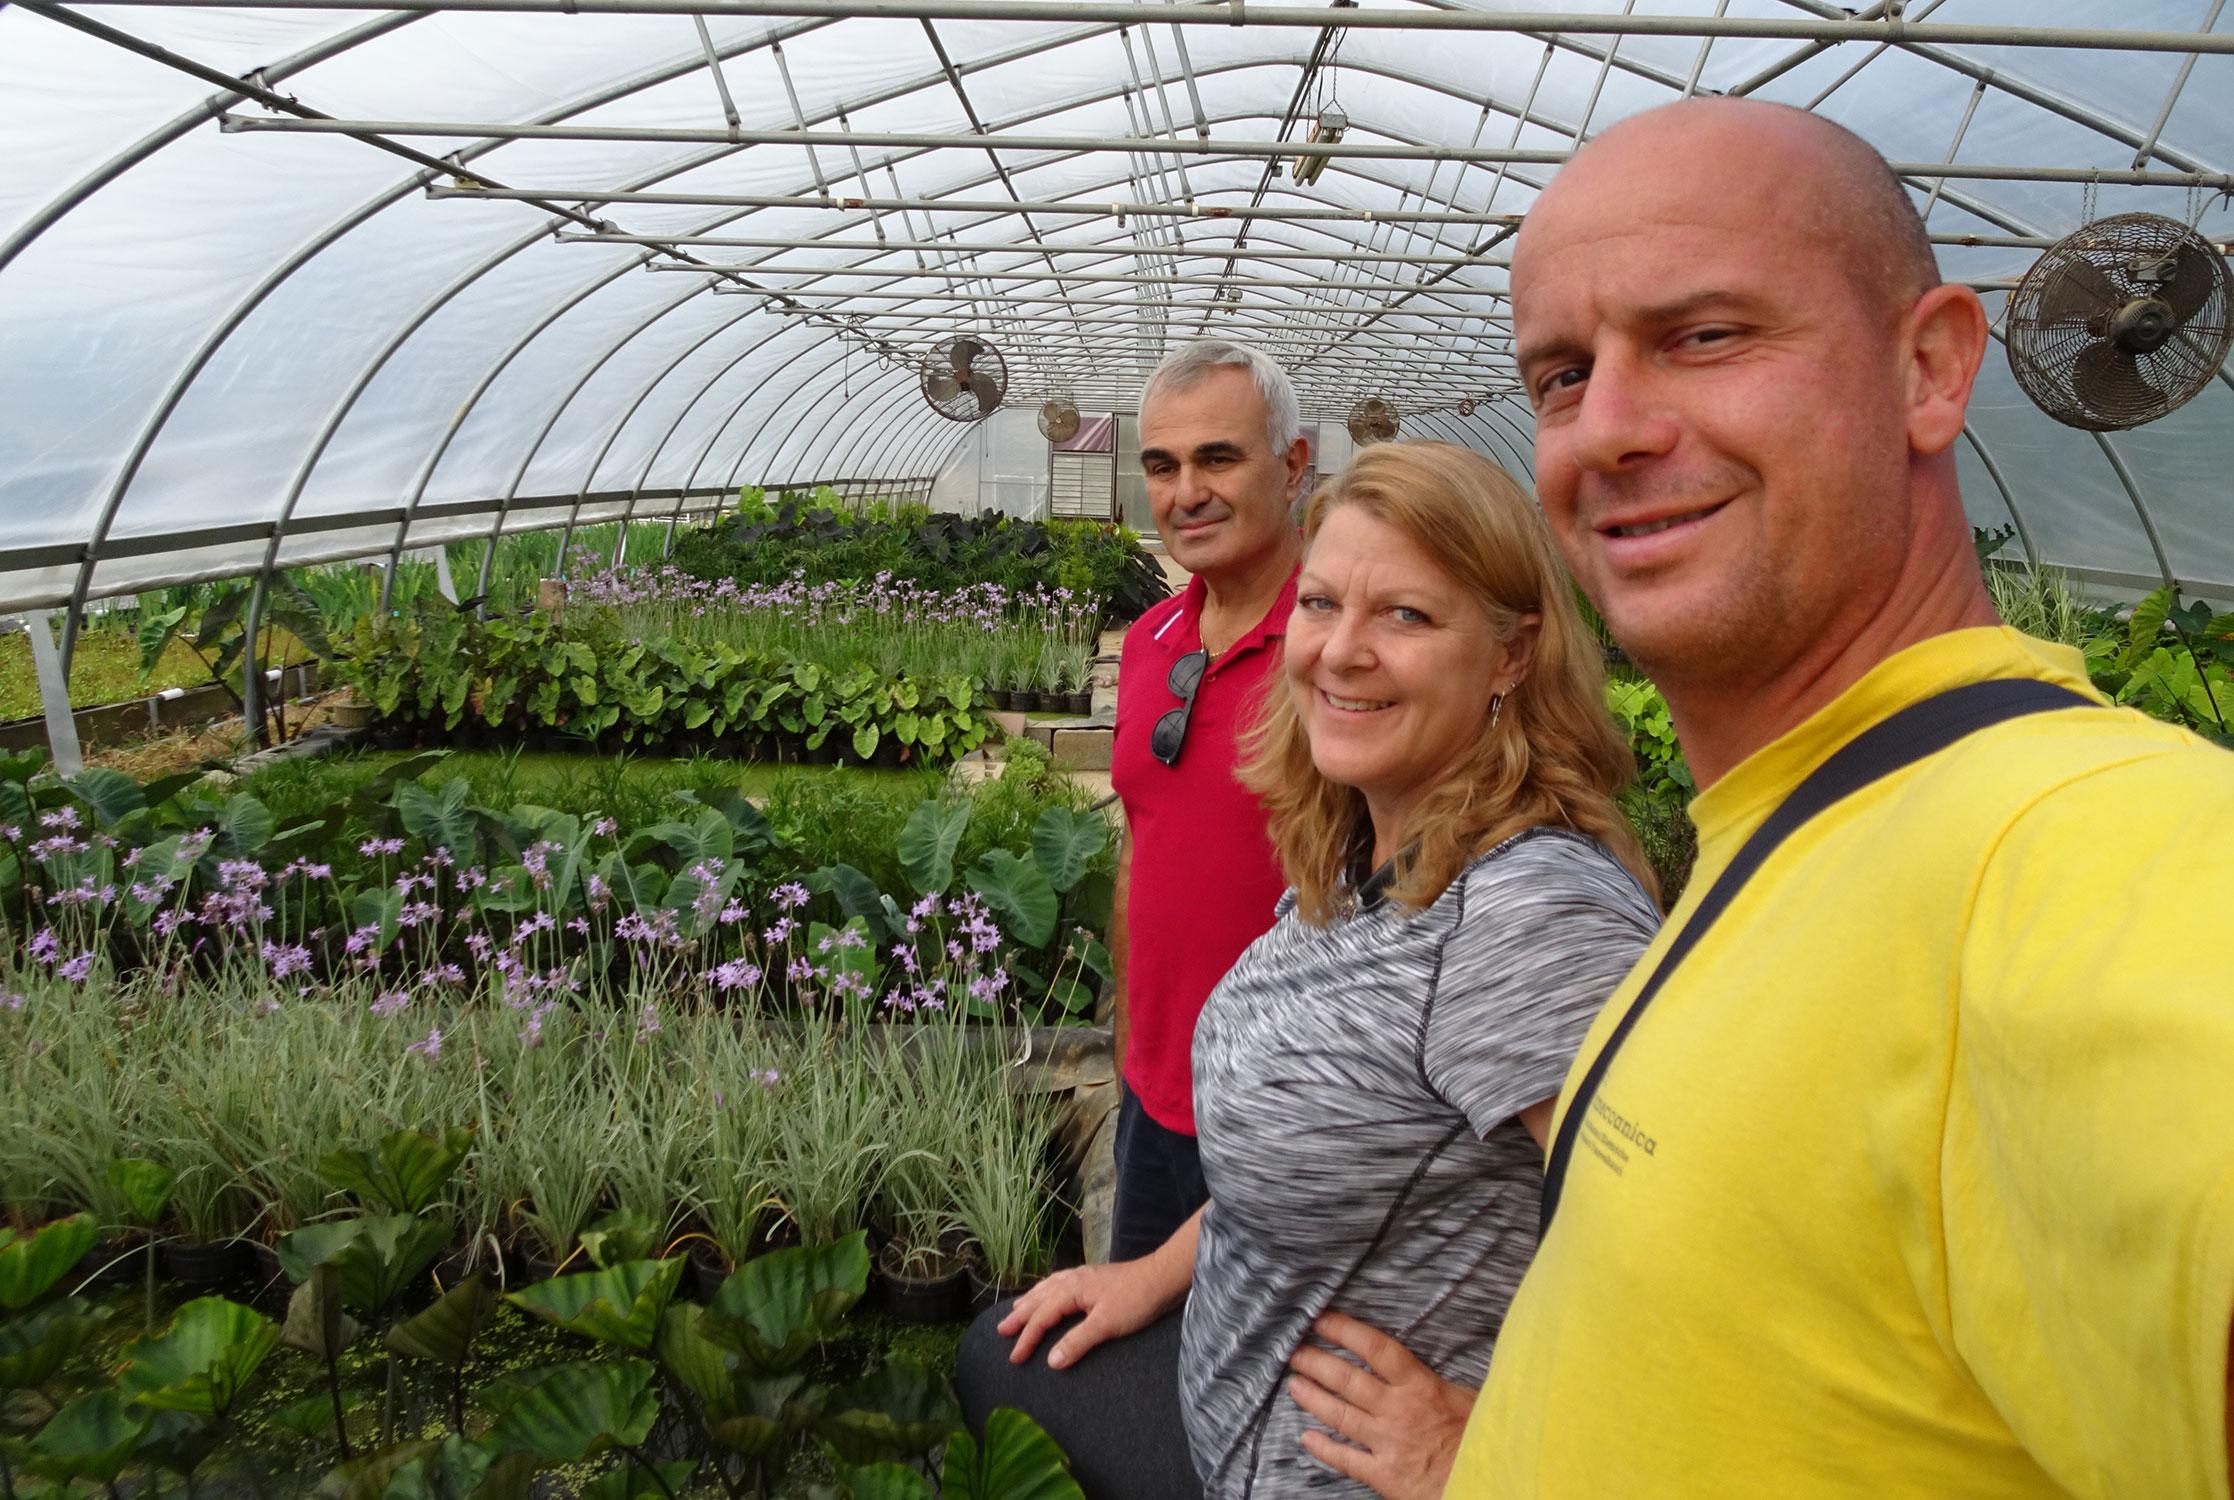 Maryland Aquatic Nursery greenhouse